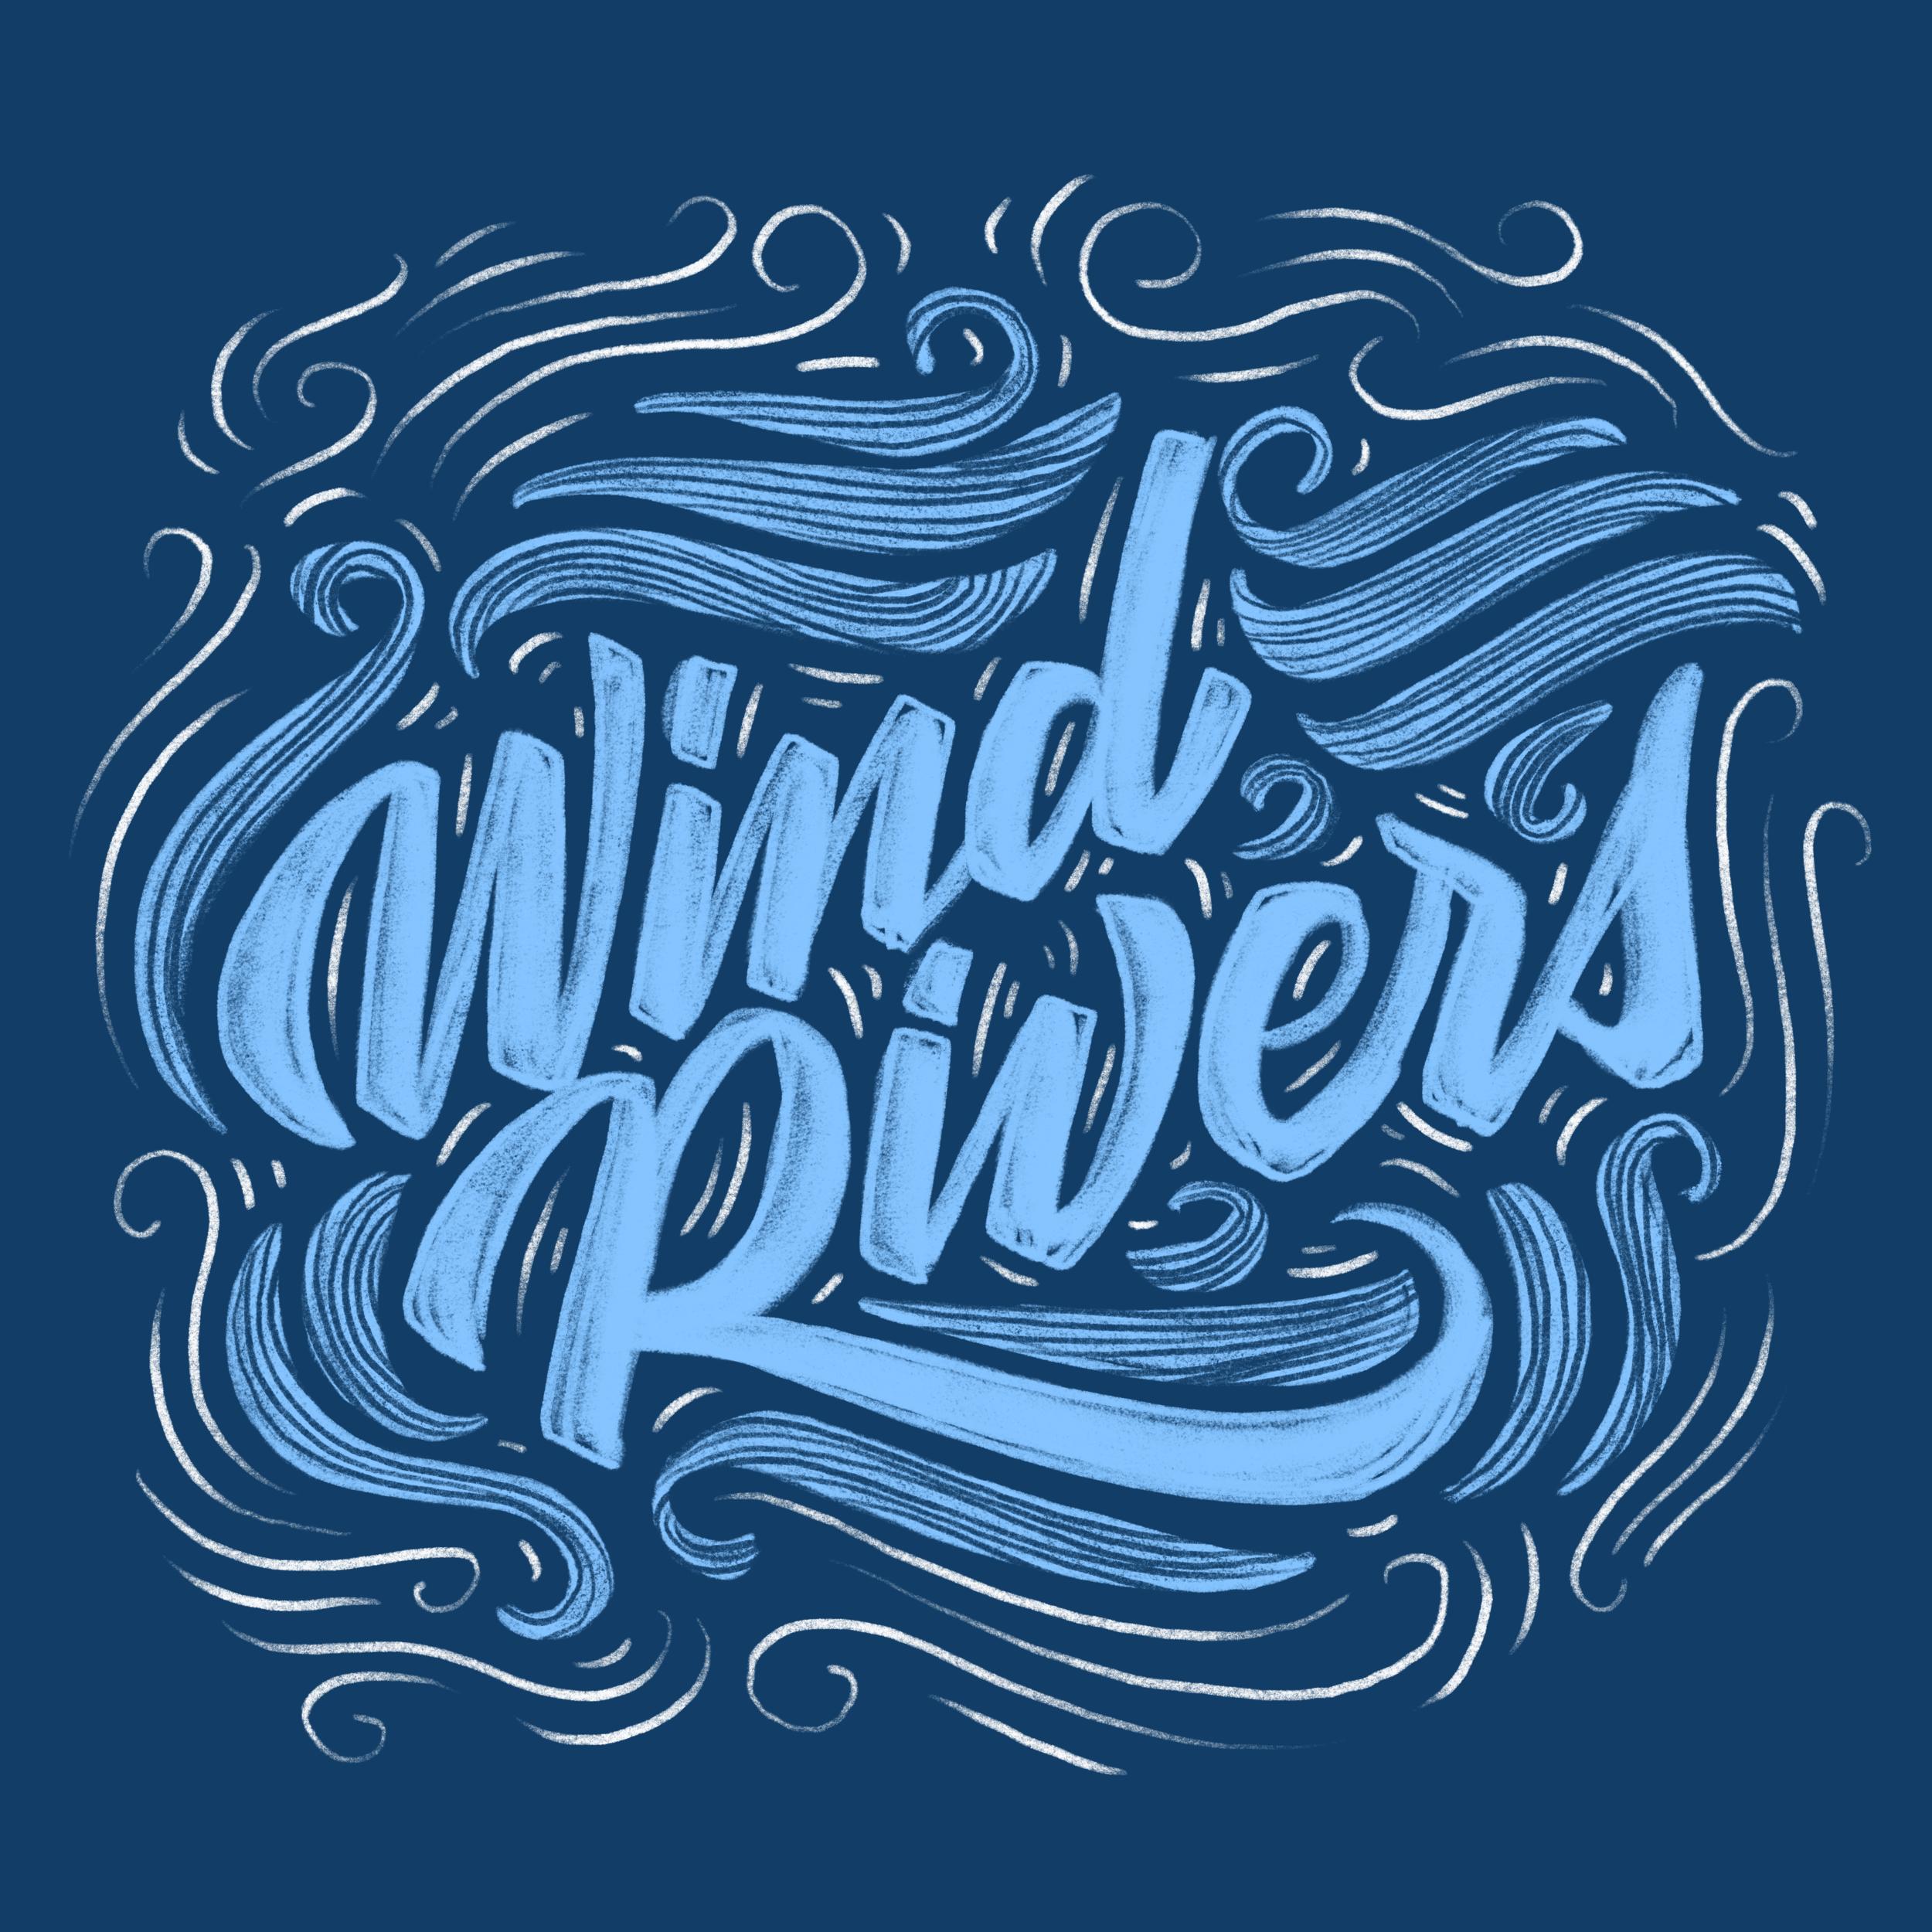 wind_rivers_procreate copy.png